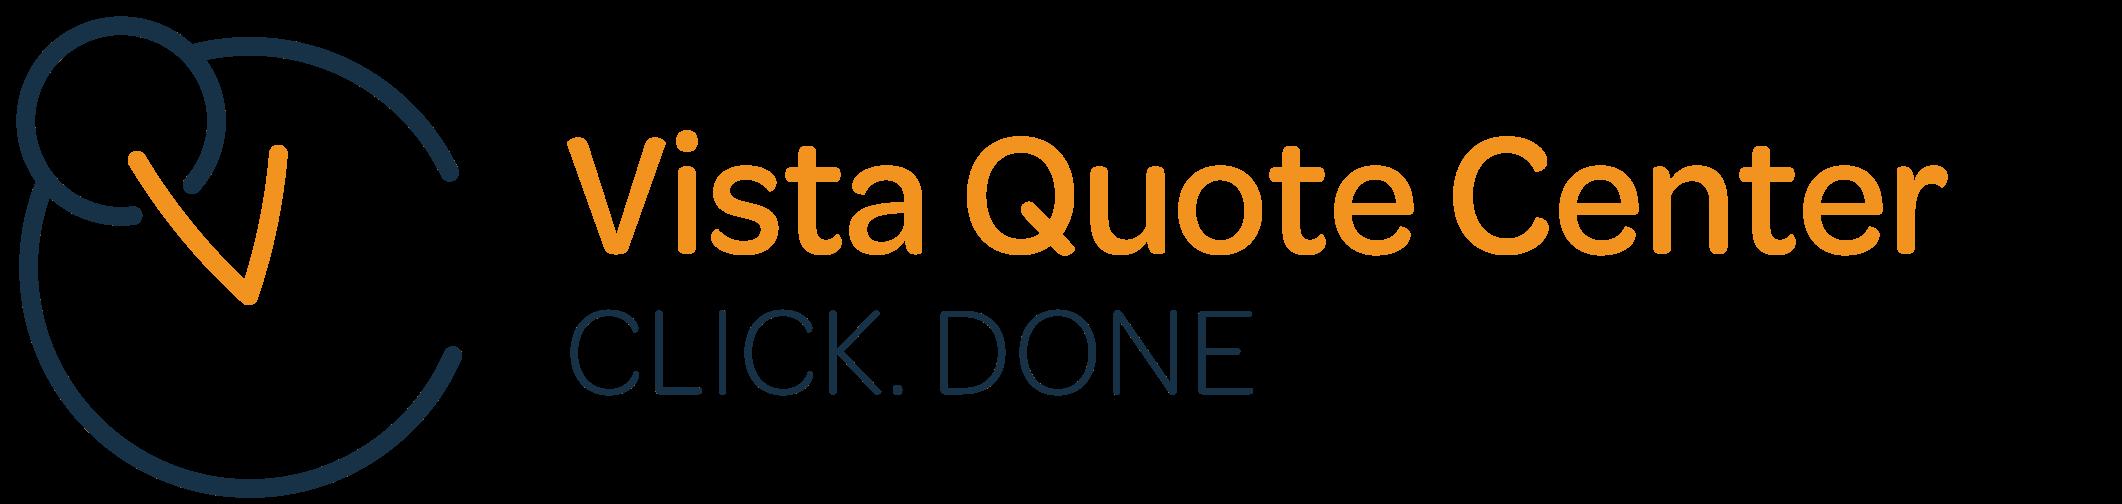 Vista Quote Center logo